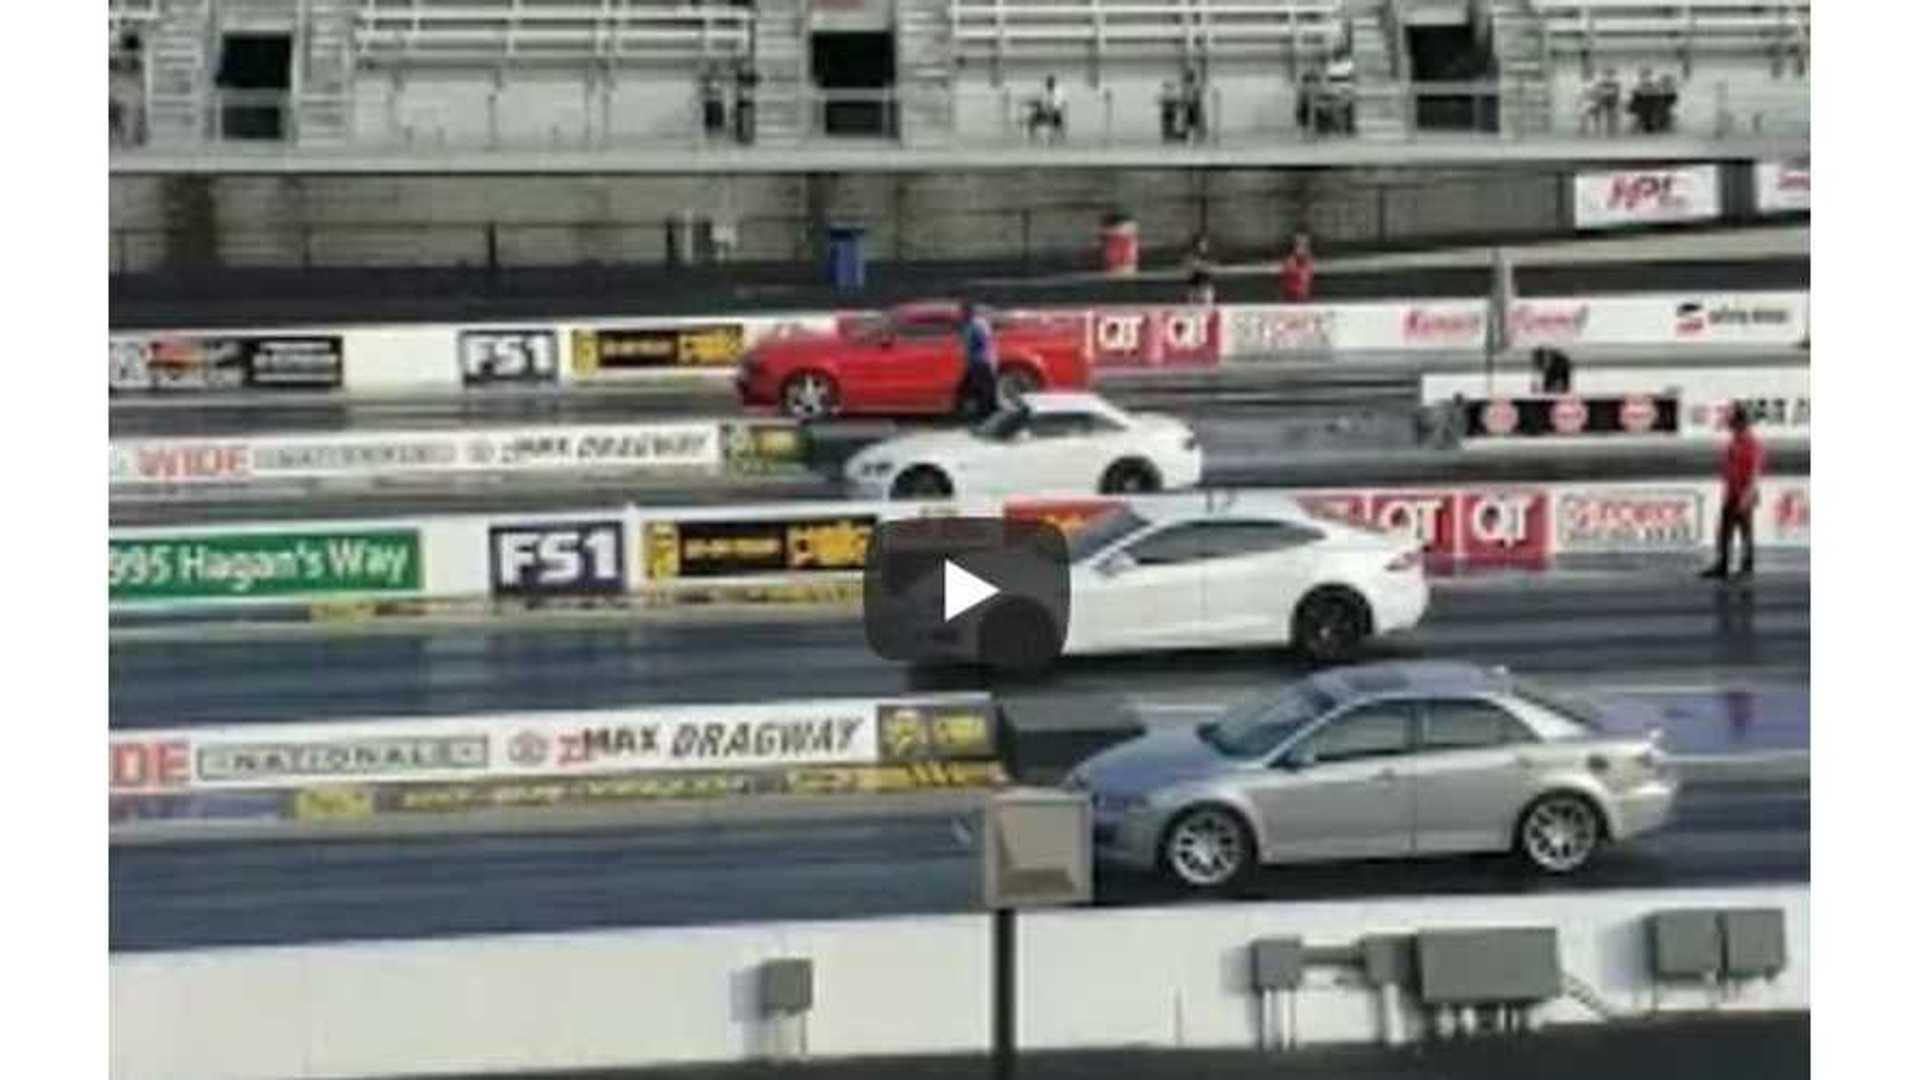 Tesla Model S Takes On Mustang, S2000, Mazda6 In 4-Wide Drag Race